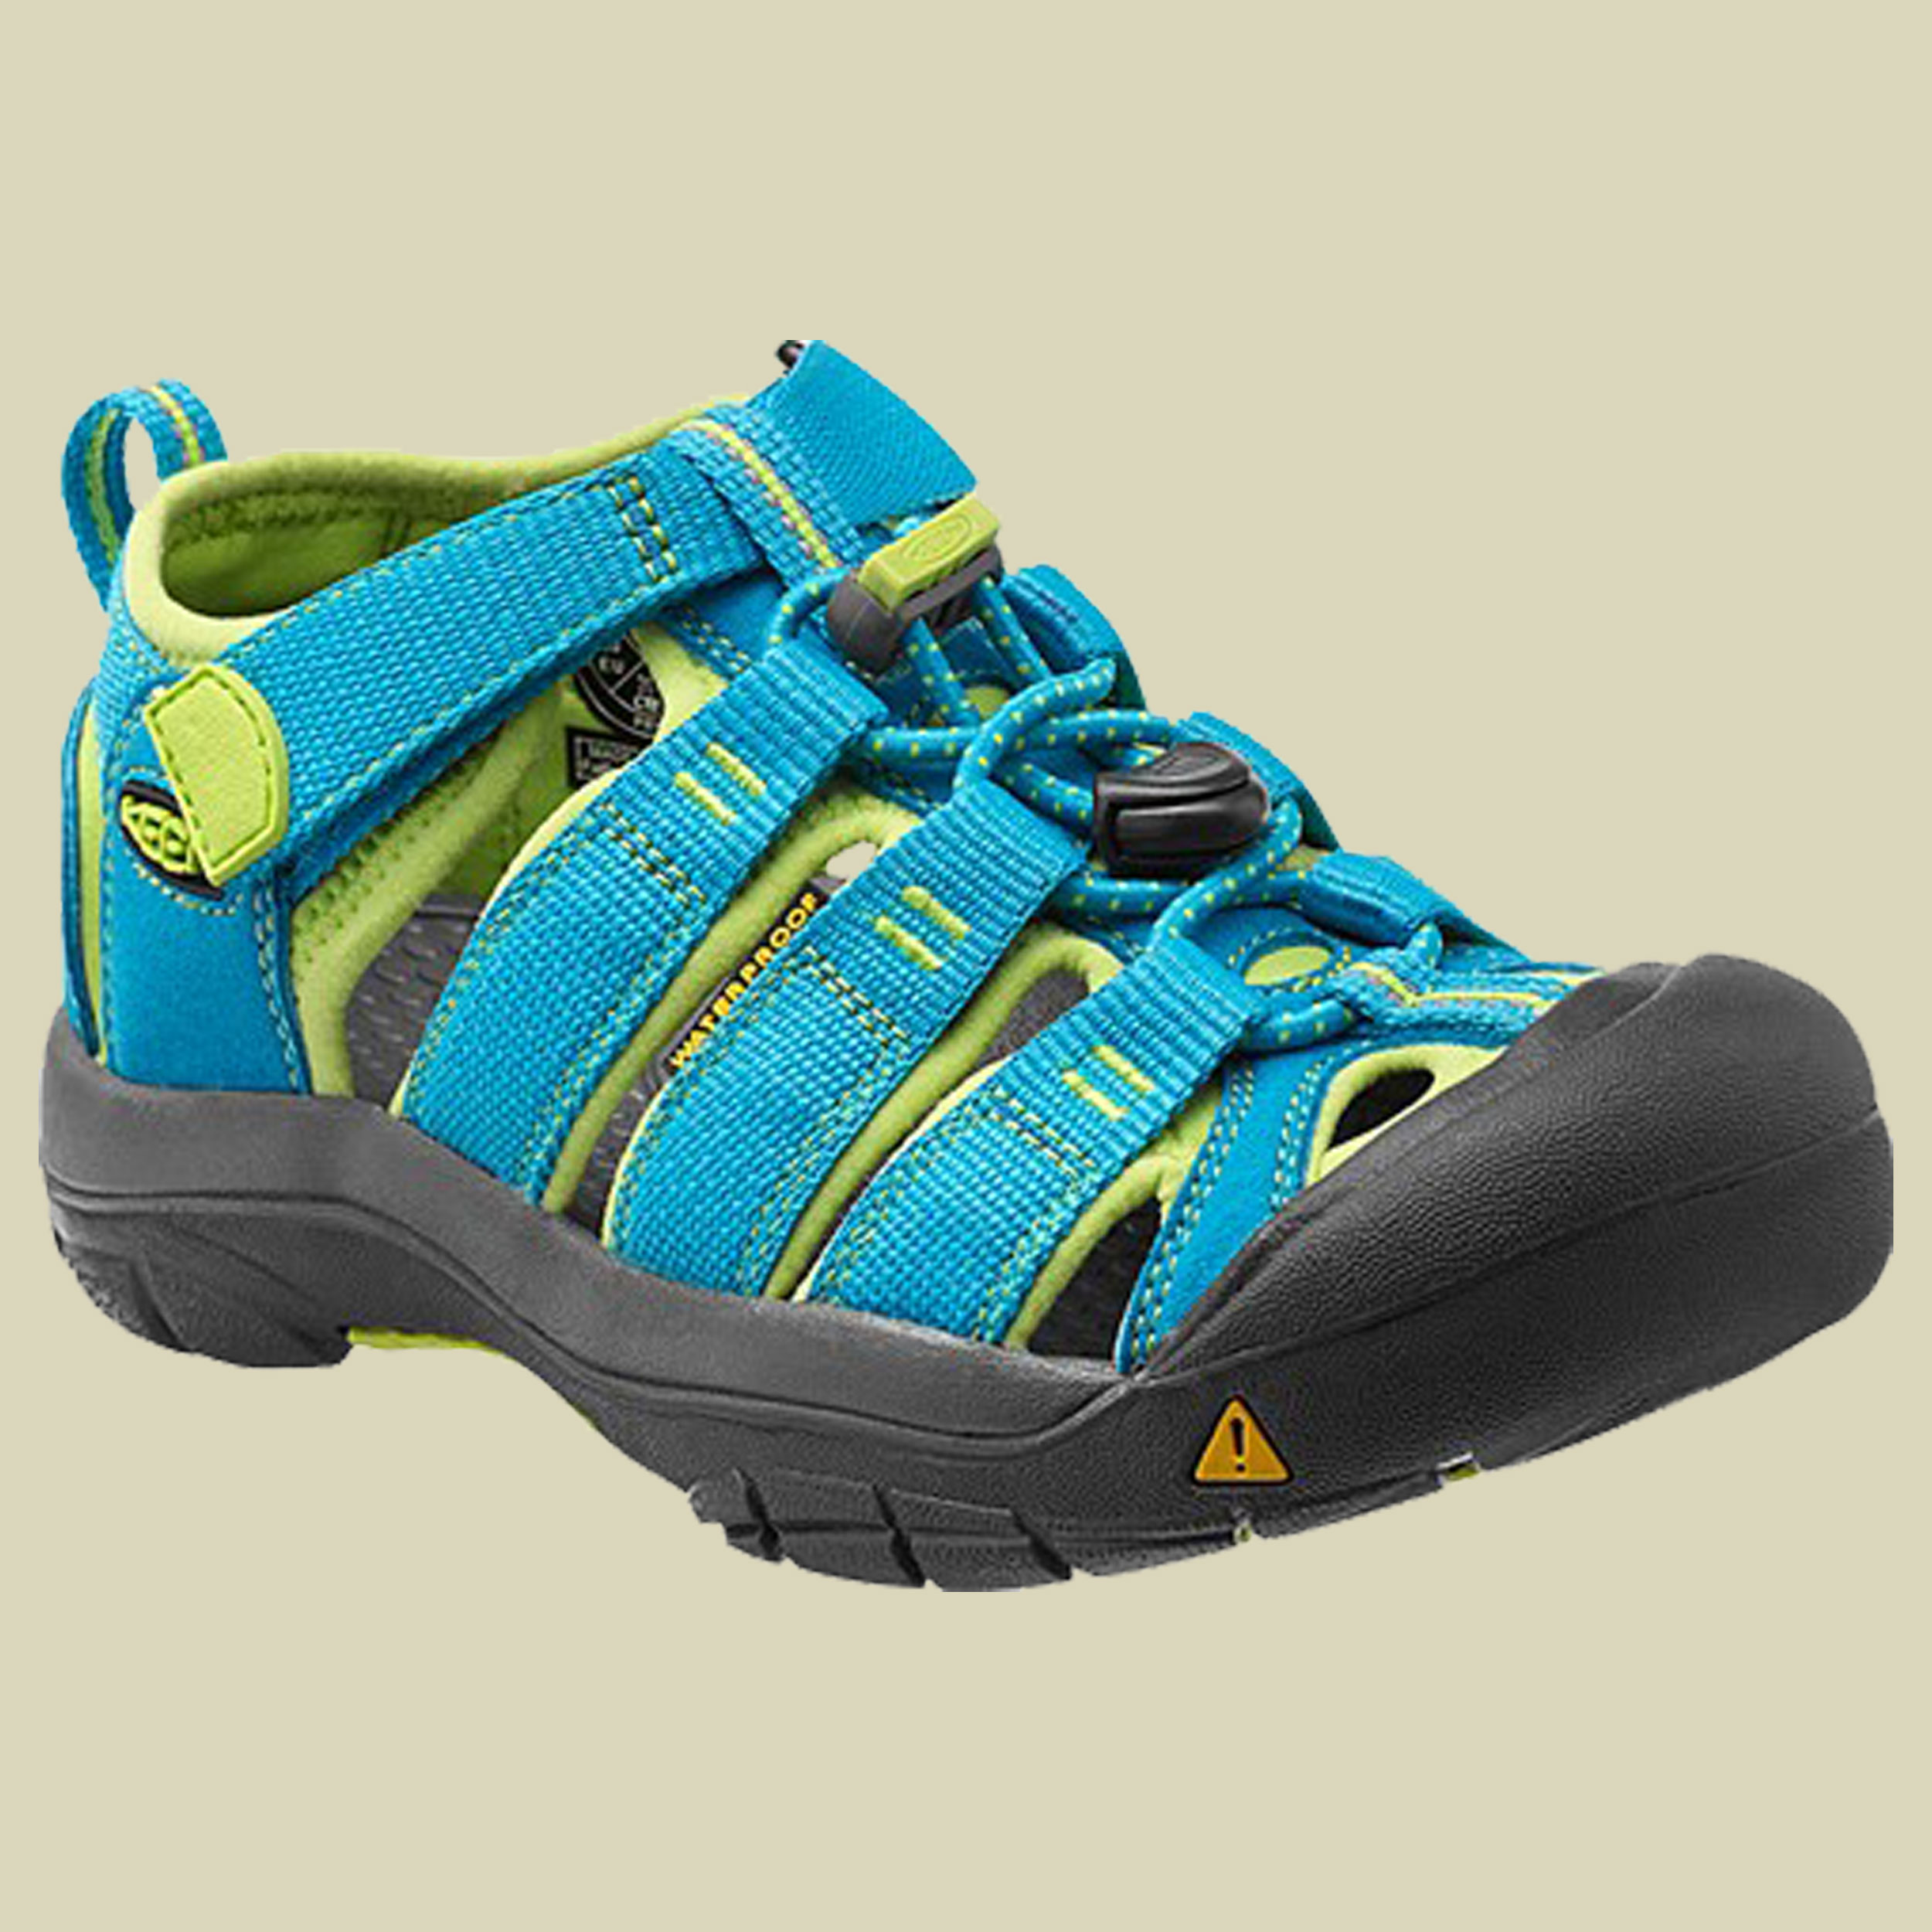 Keen Newport H2 Kids Trekking Sandale Kinder Größe 31 hawaiian blue-green glow